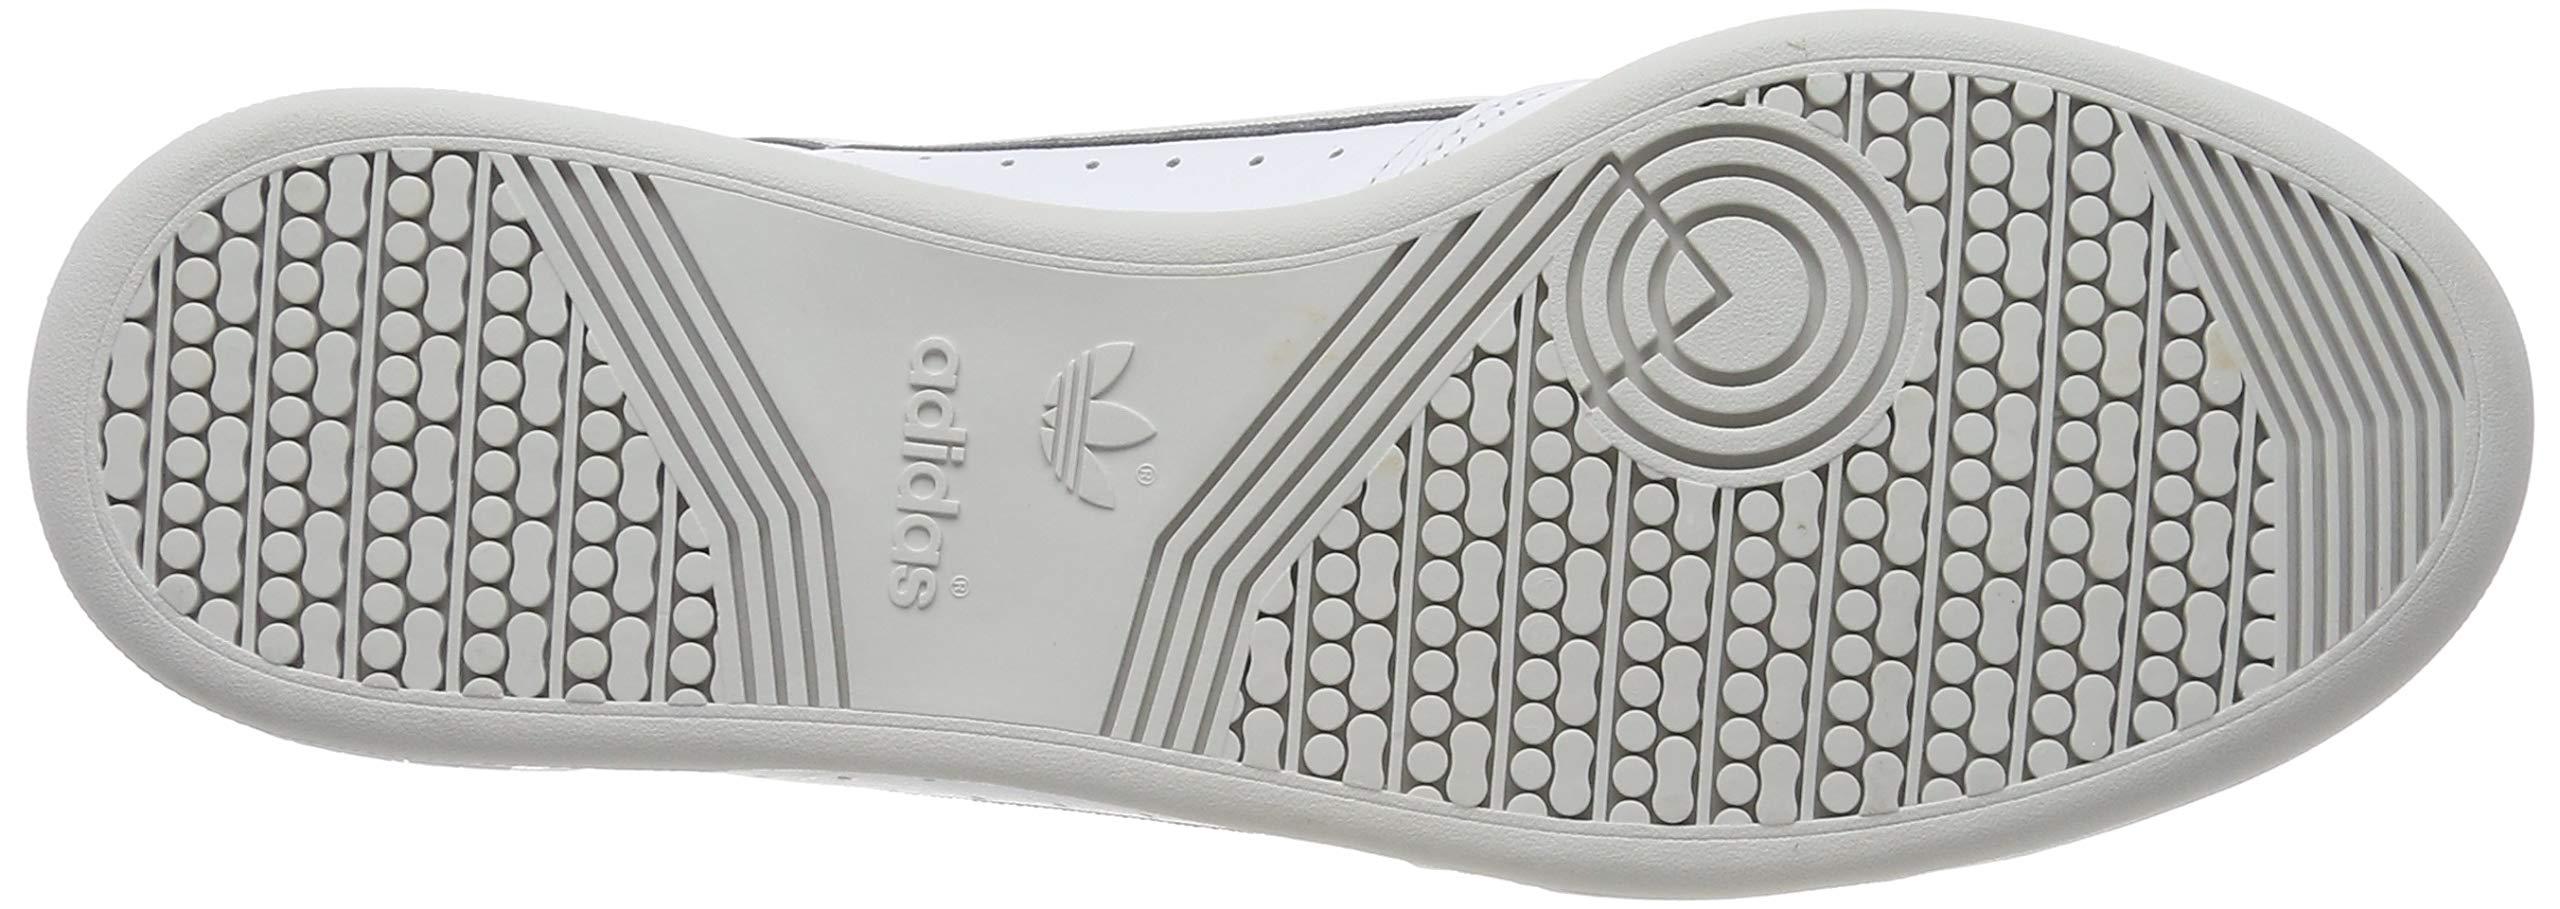 adidas Continental 80, Scarpe da Ginnastica Uomo 13 spesavip